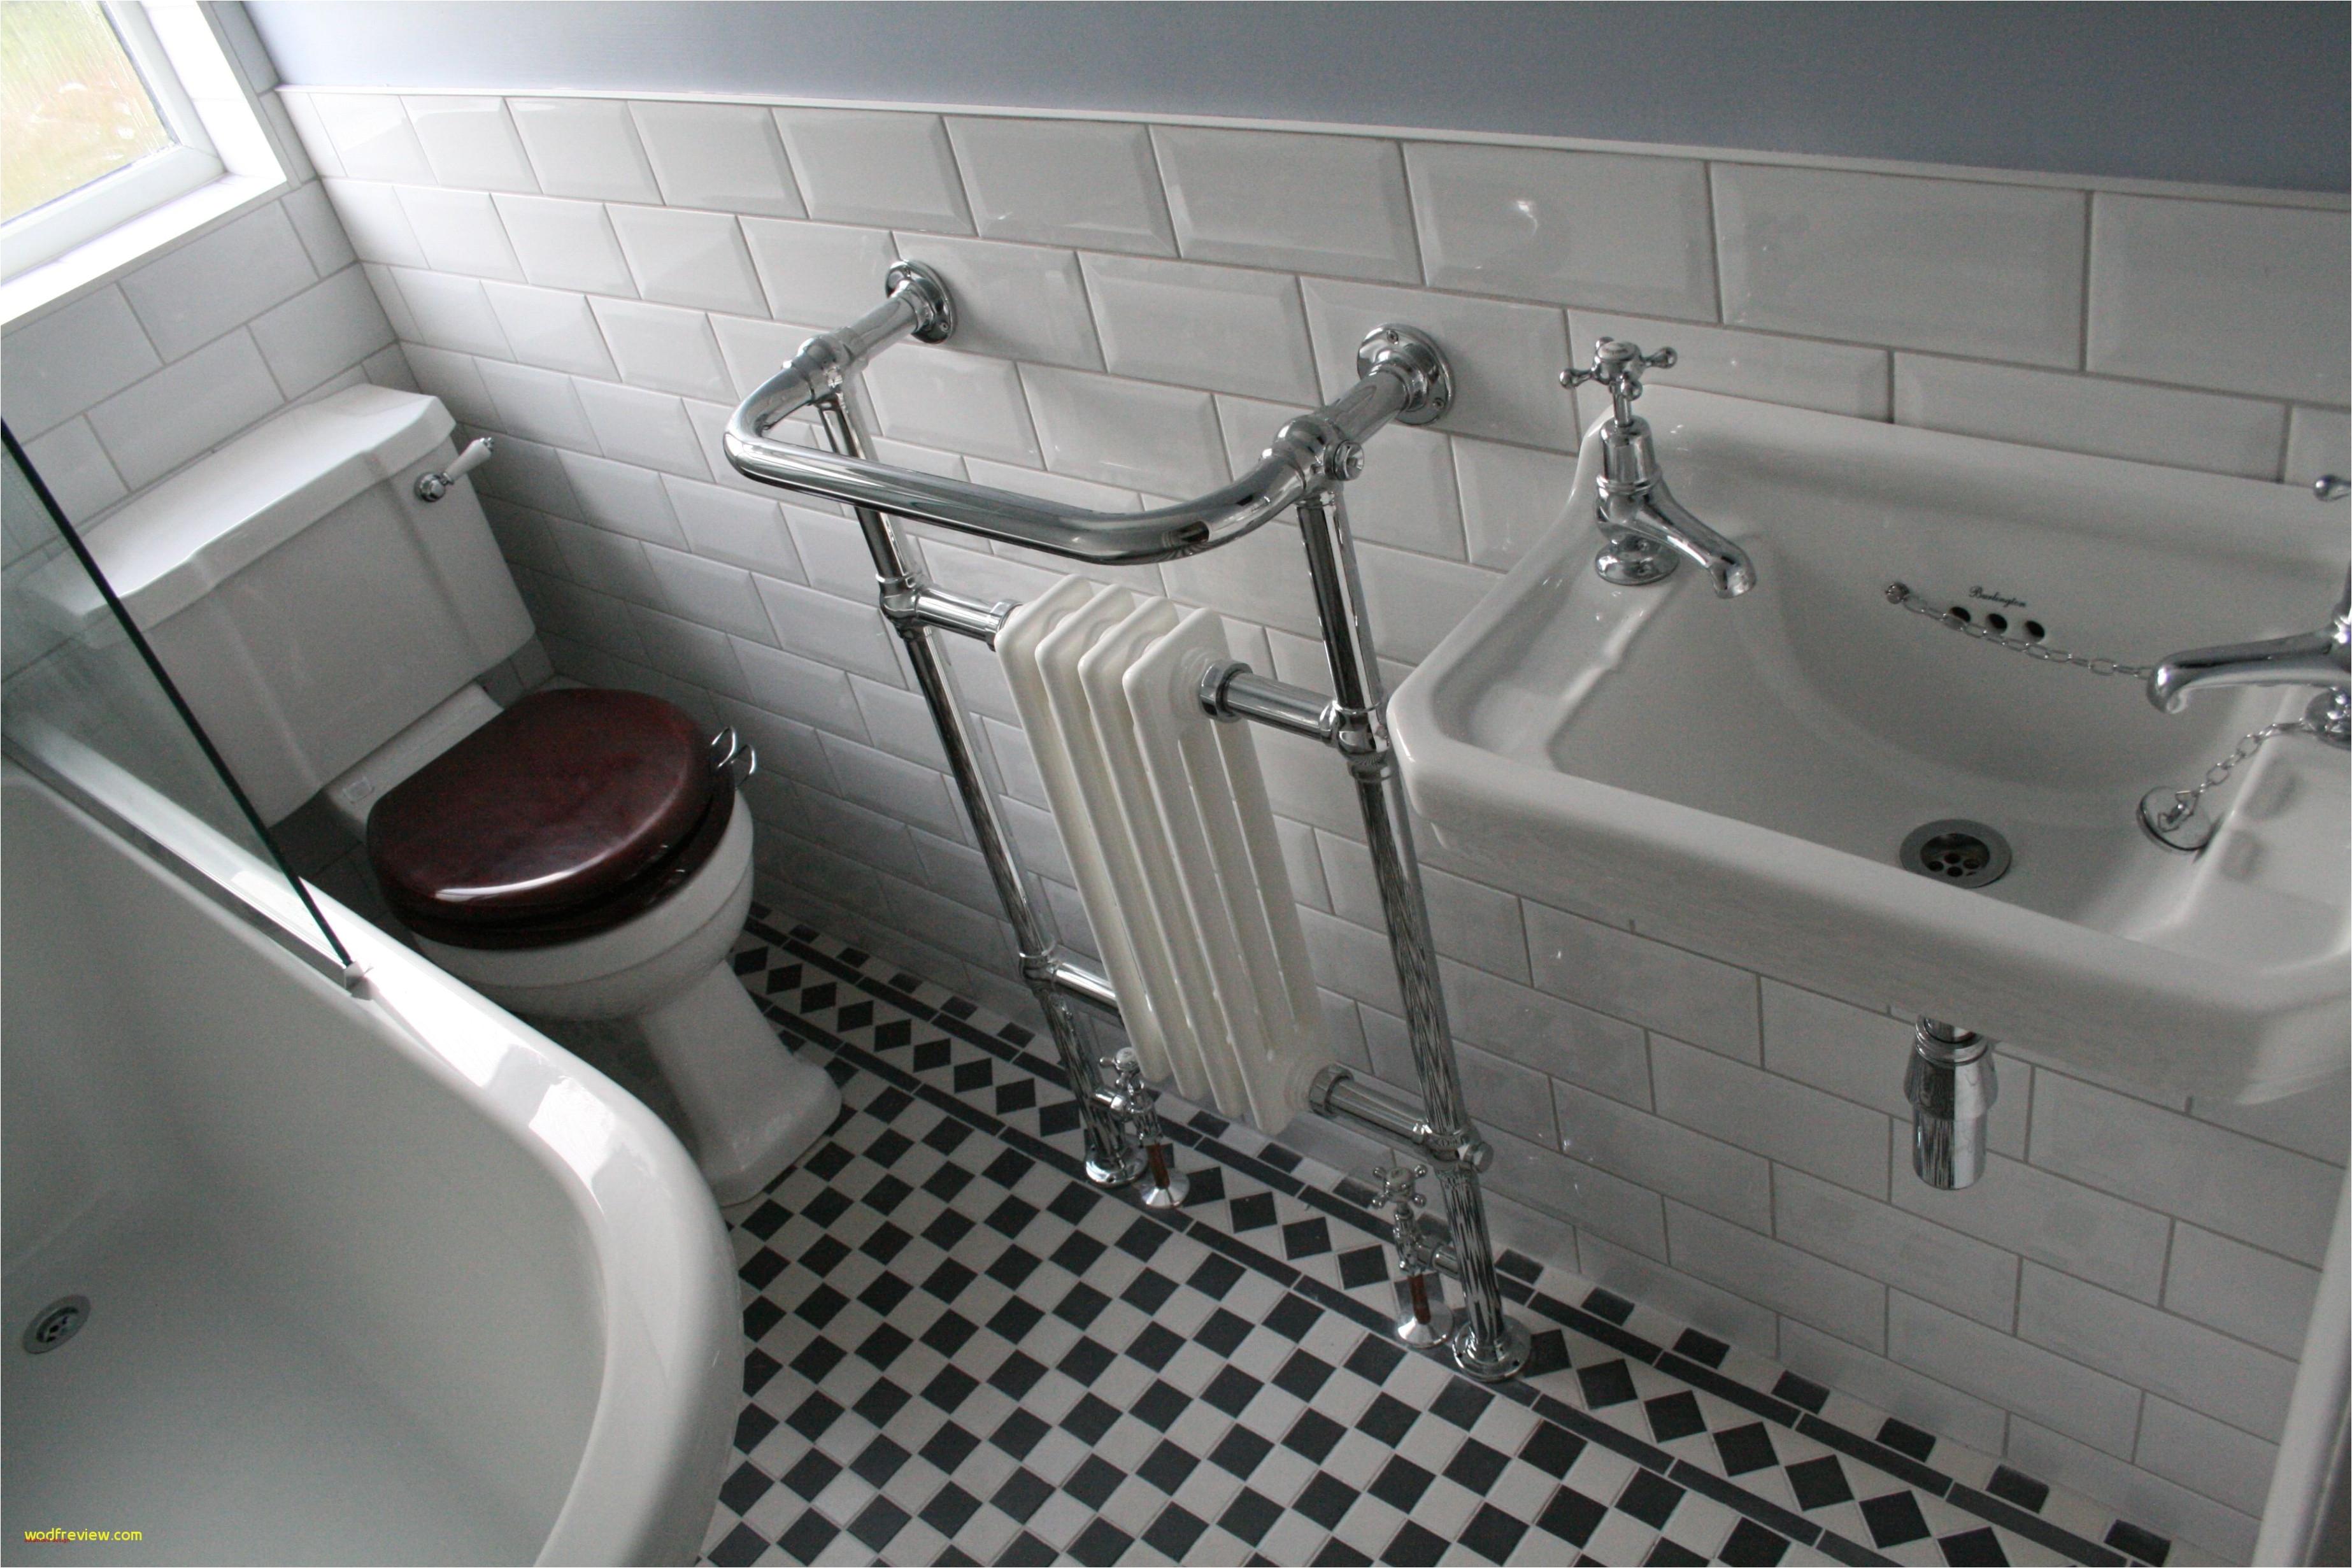 Small Bathroom Design Hgtv Beautiful Bathroom 26 Bathroom Tiles Design Magnificent Black and White X7s